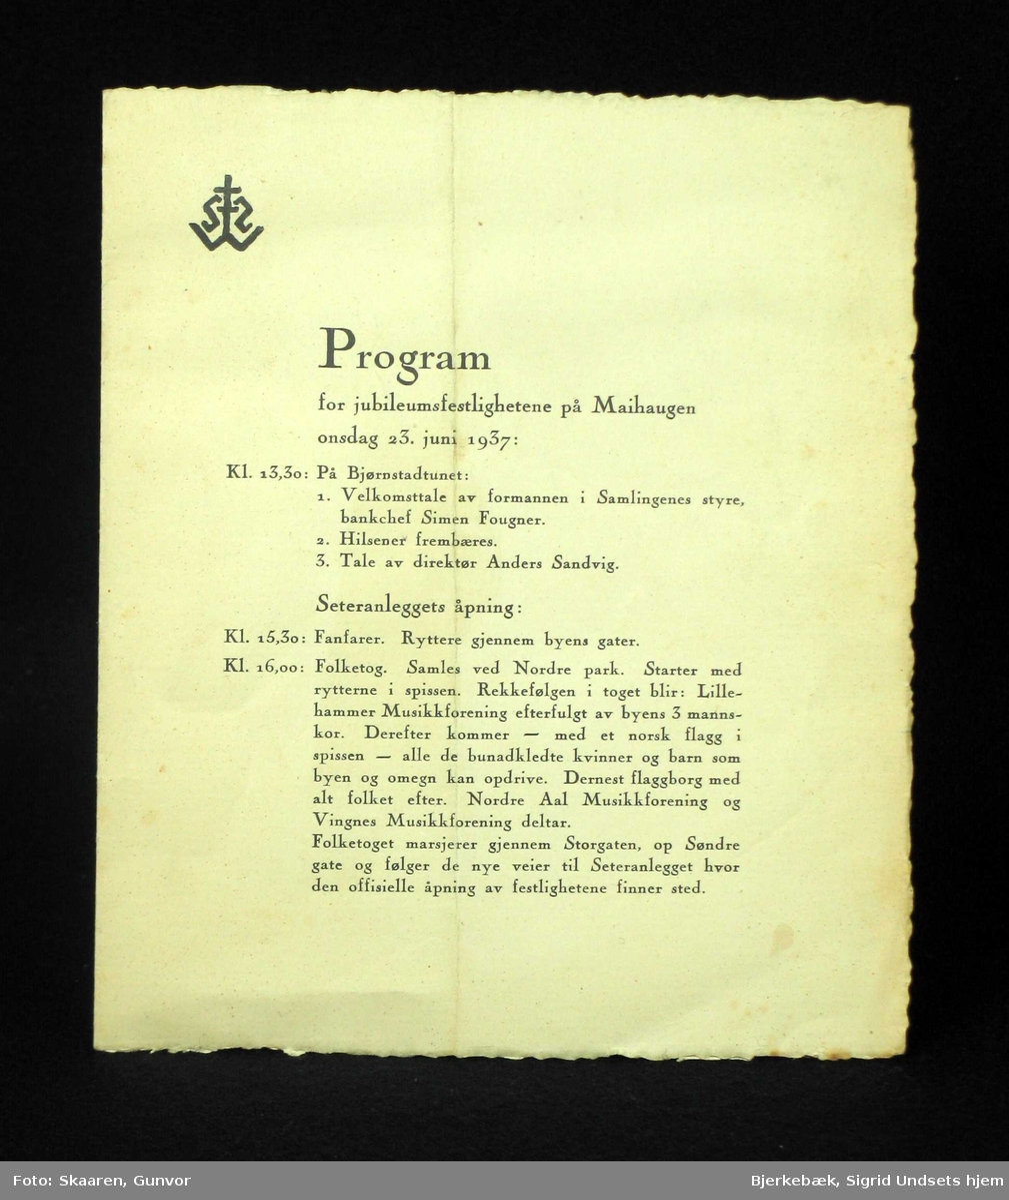 Program for jubileumsfestlighetene på Maihaugen 23. juni 1937. Et papirark på 2 blad (4 sider). Øverst til venstre er Maihaugens logo trykket.